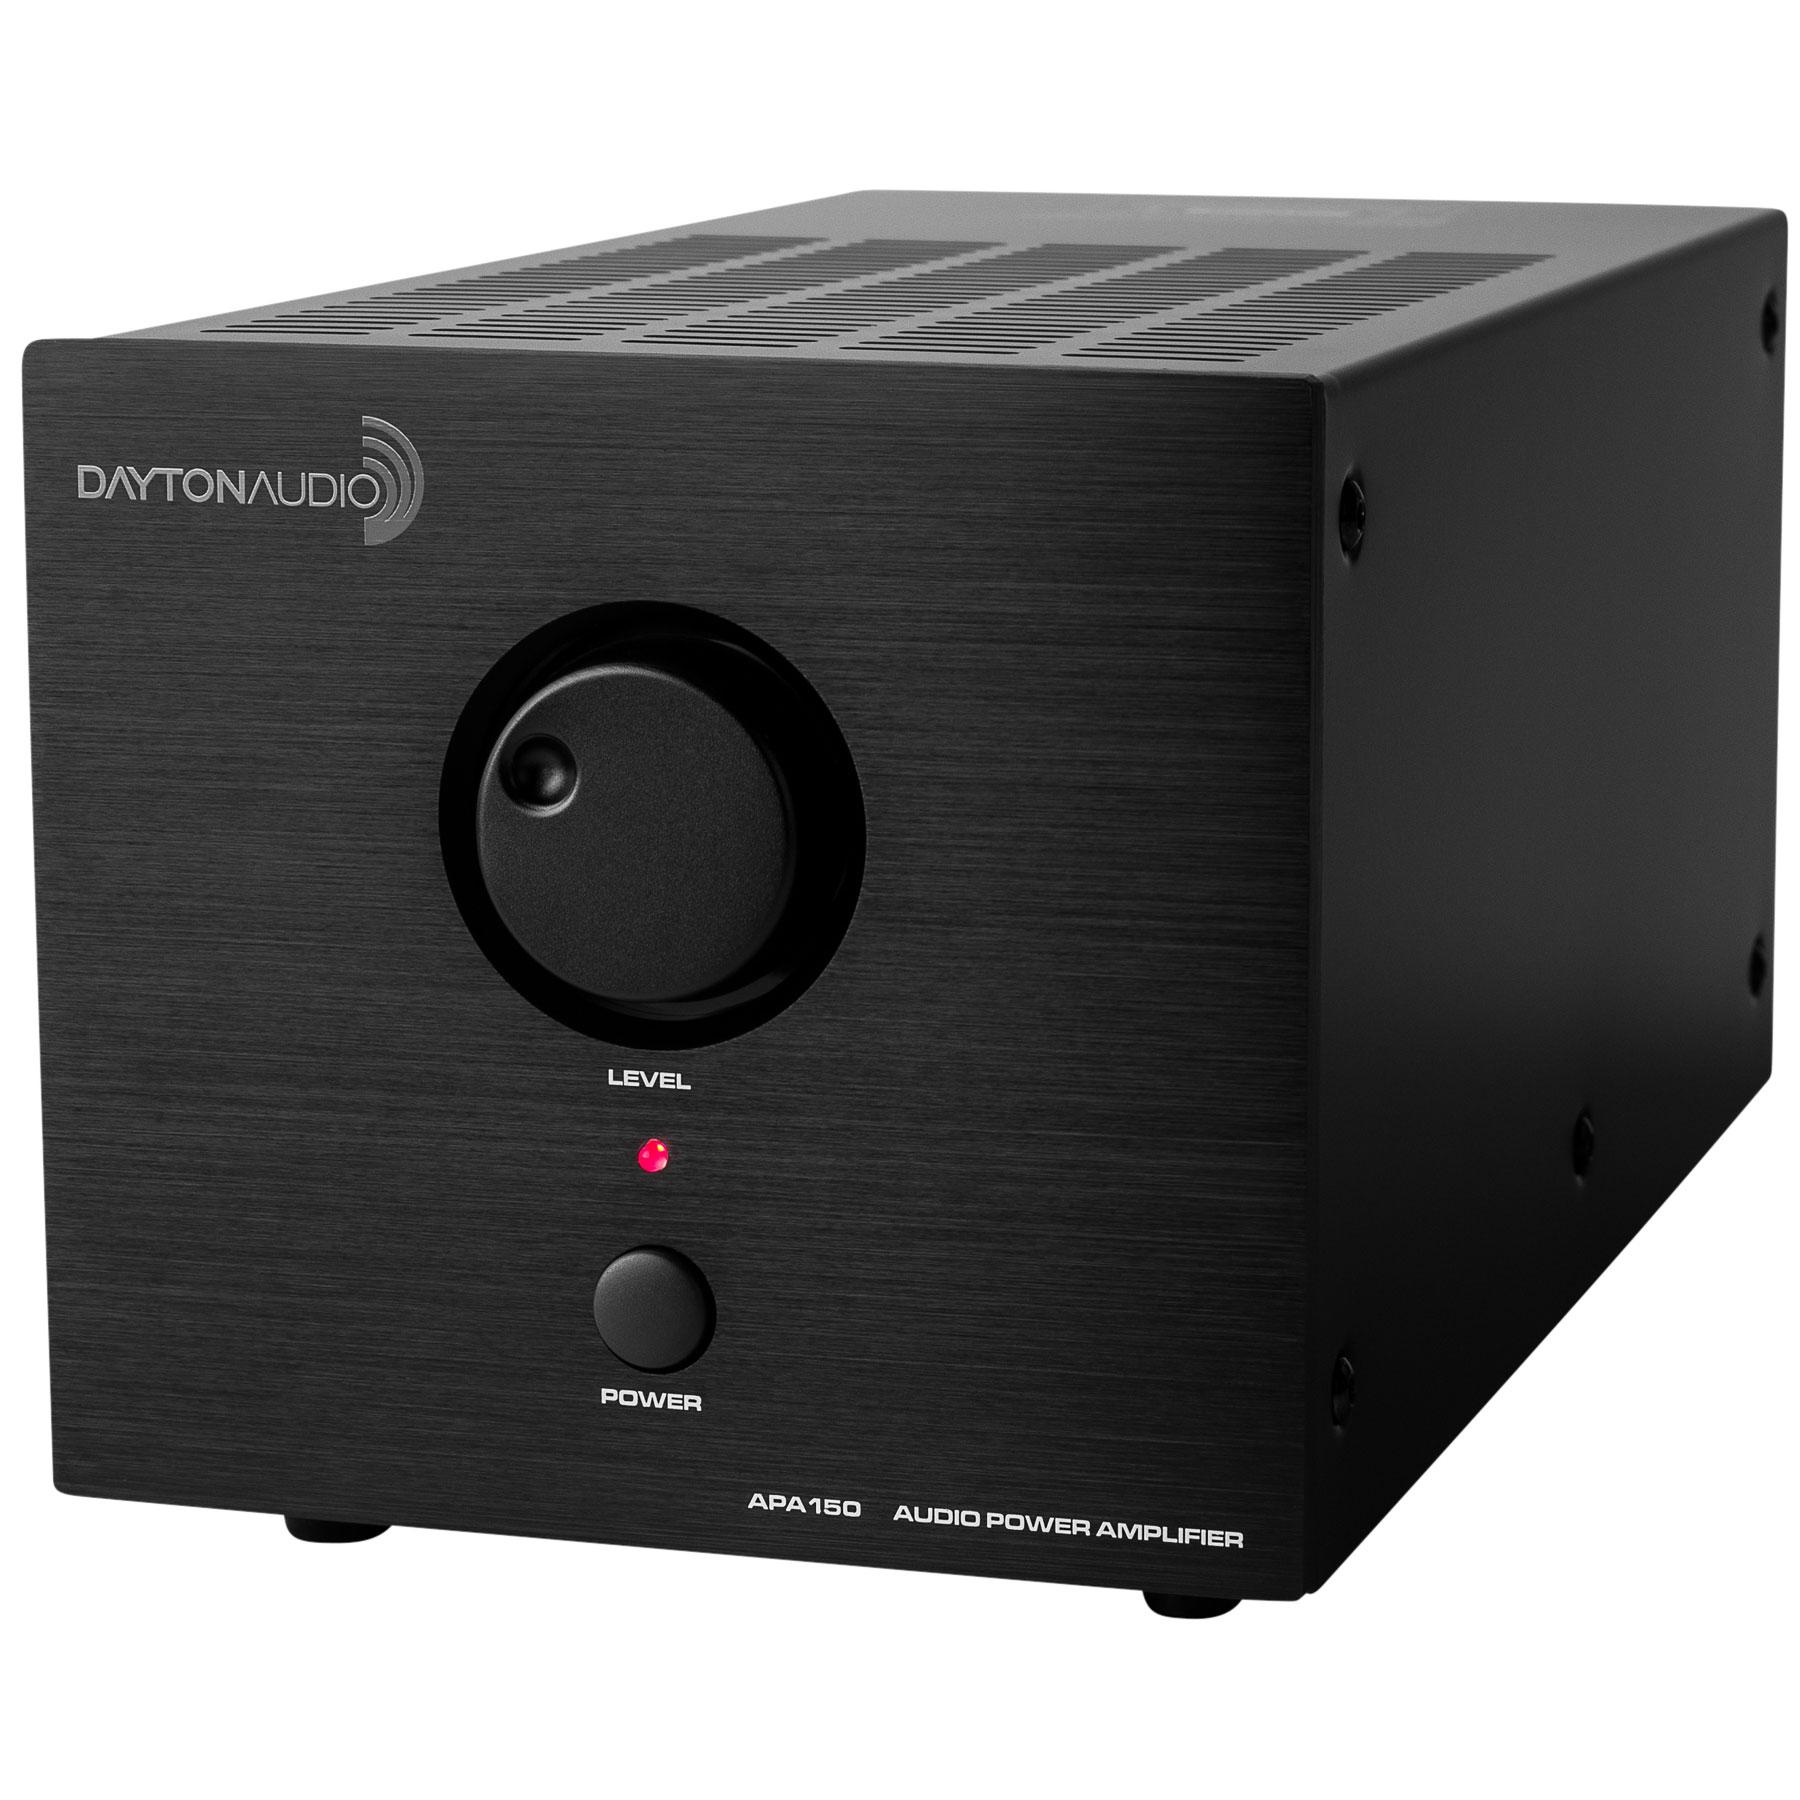 Dayton Audio APA150 Amplificateur de bureau Class A/B 1x150W 8 Ohm 2x75W 4 Ohm